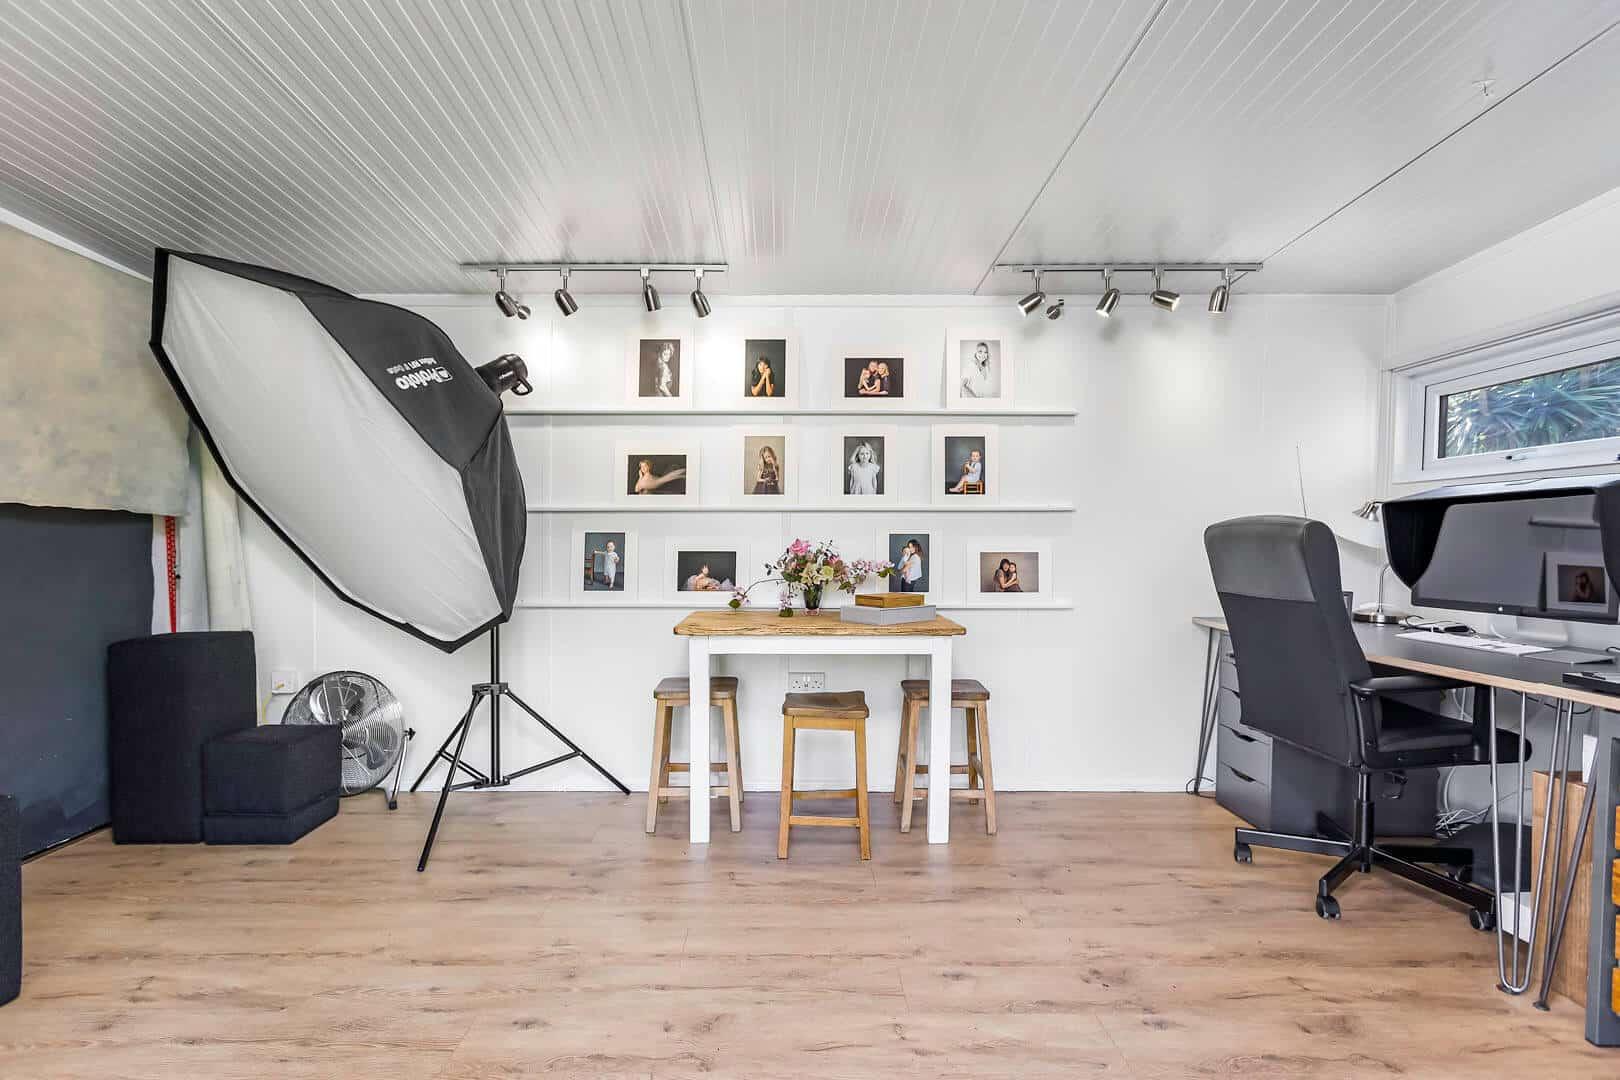 7.5m x 3m Home Photography Studio Gallery | Green Retreats